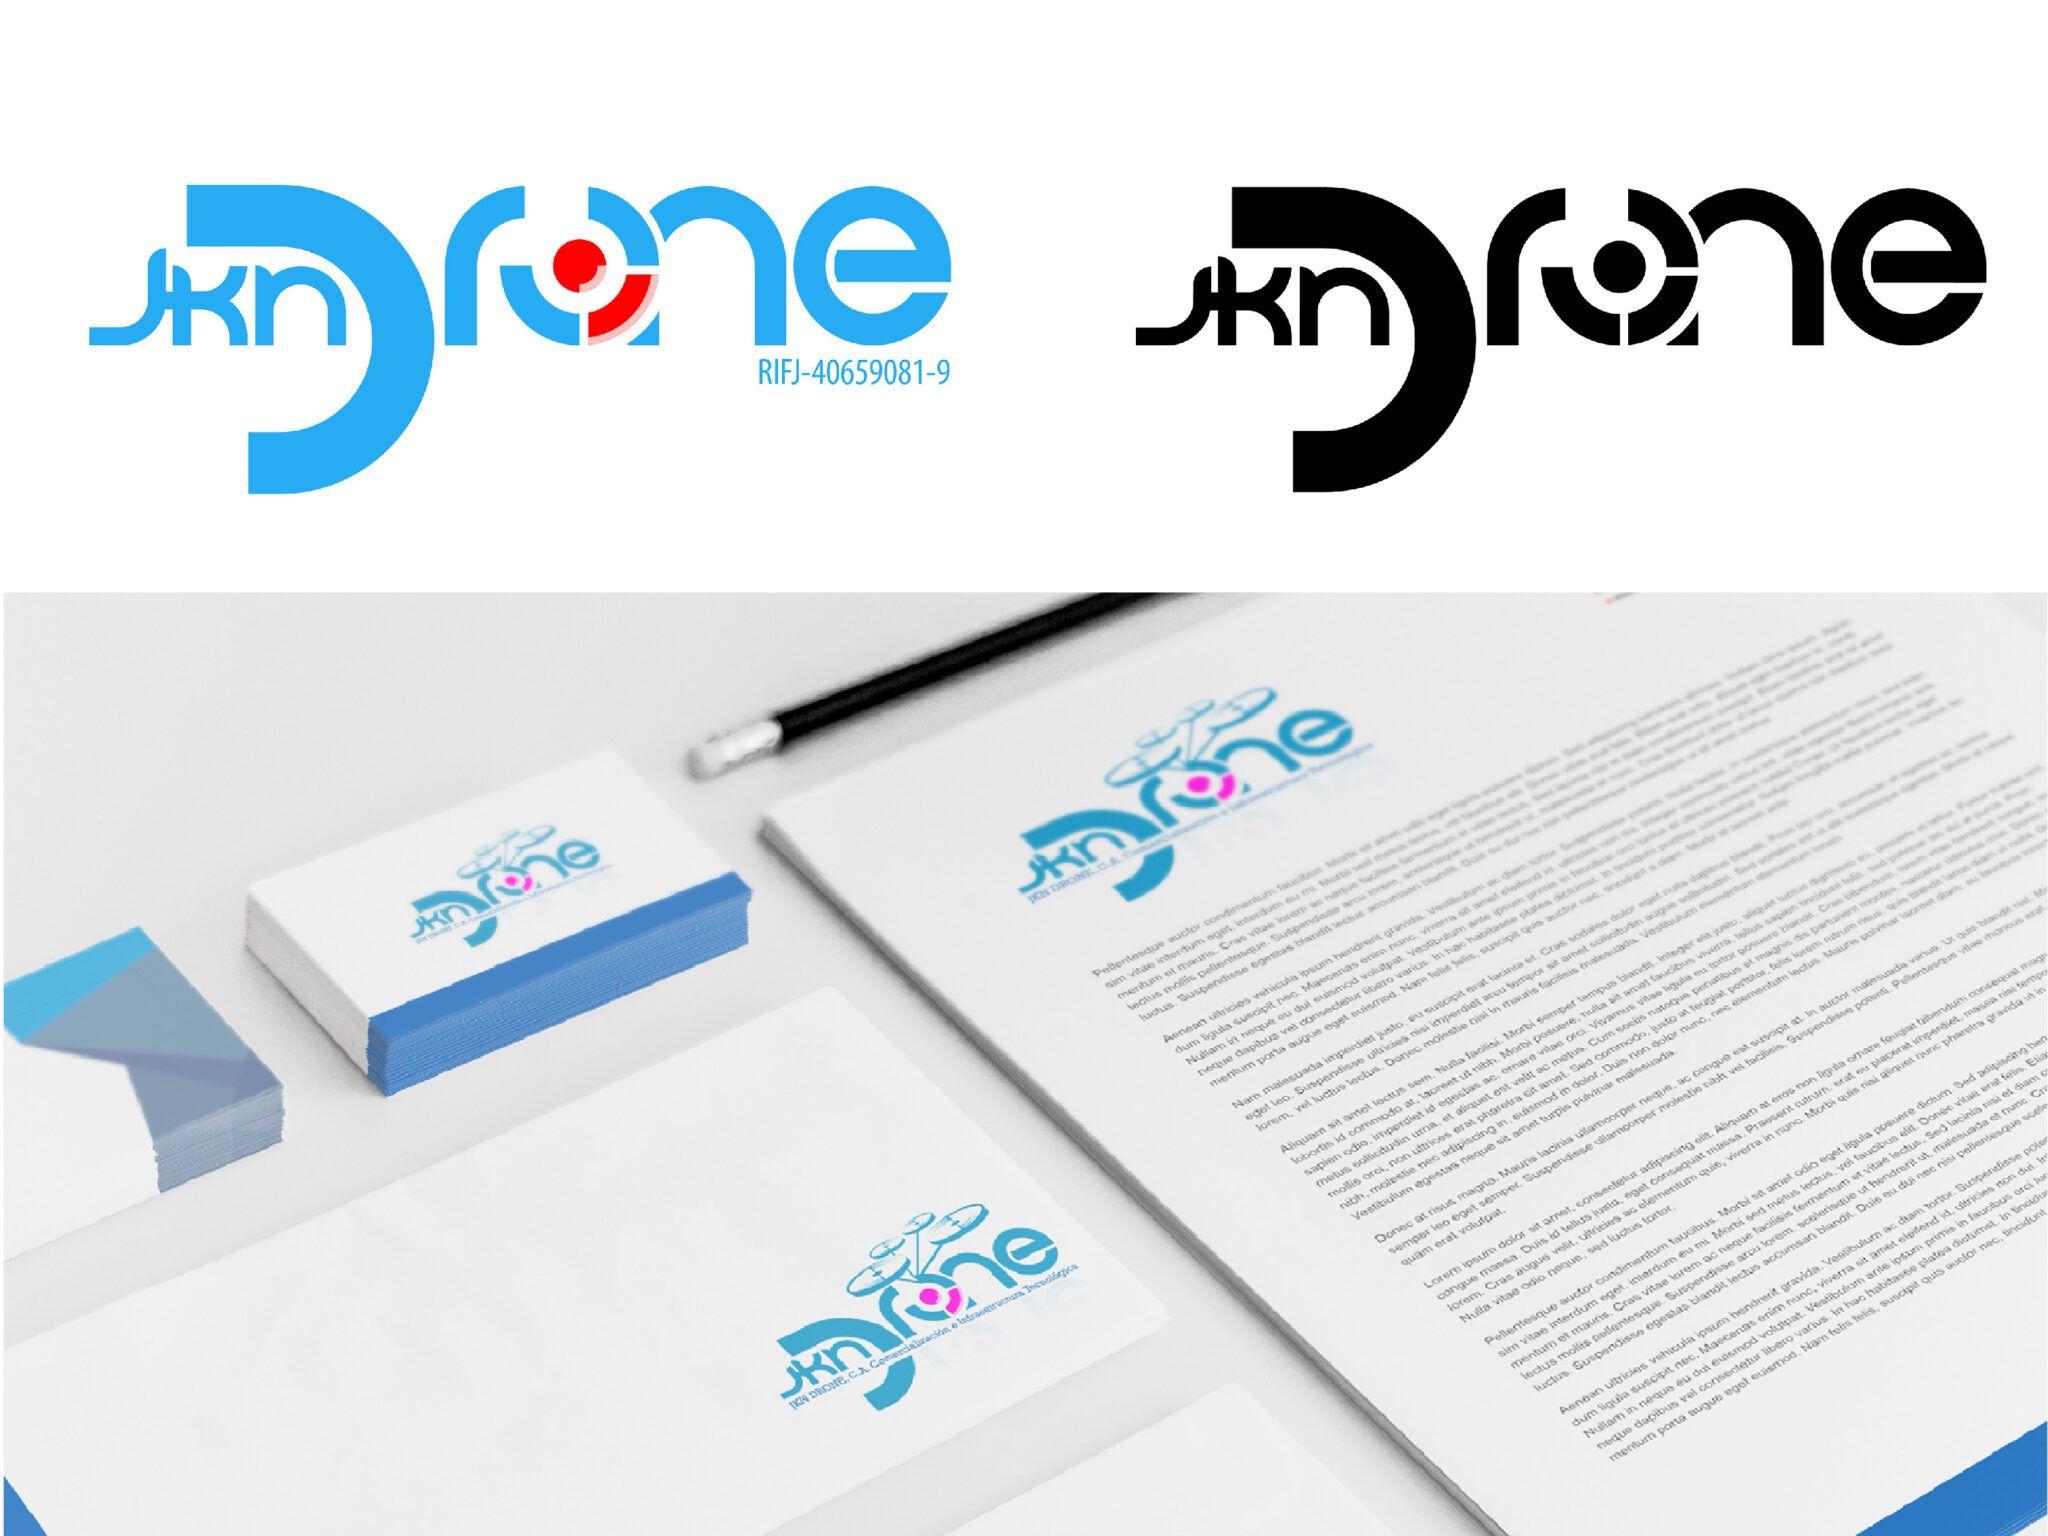 logo_jkn_Drone